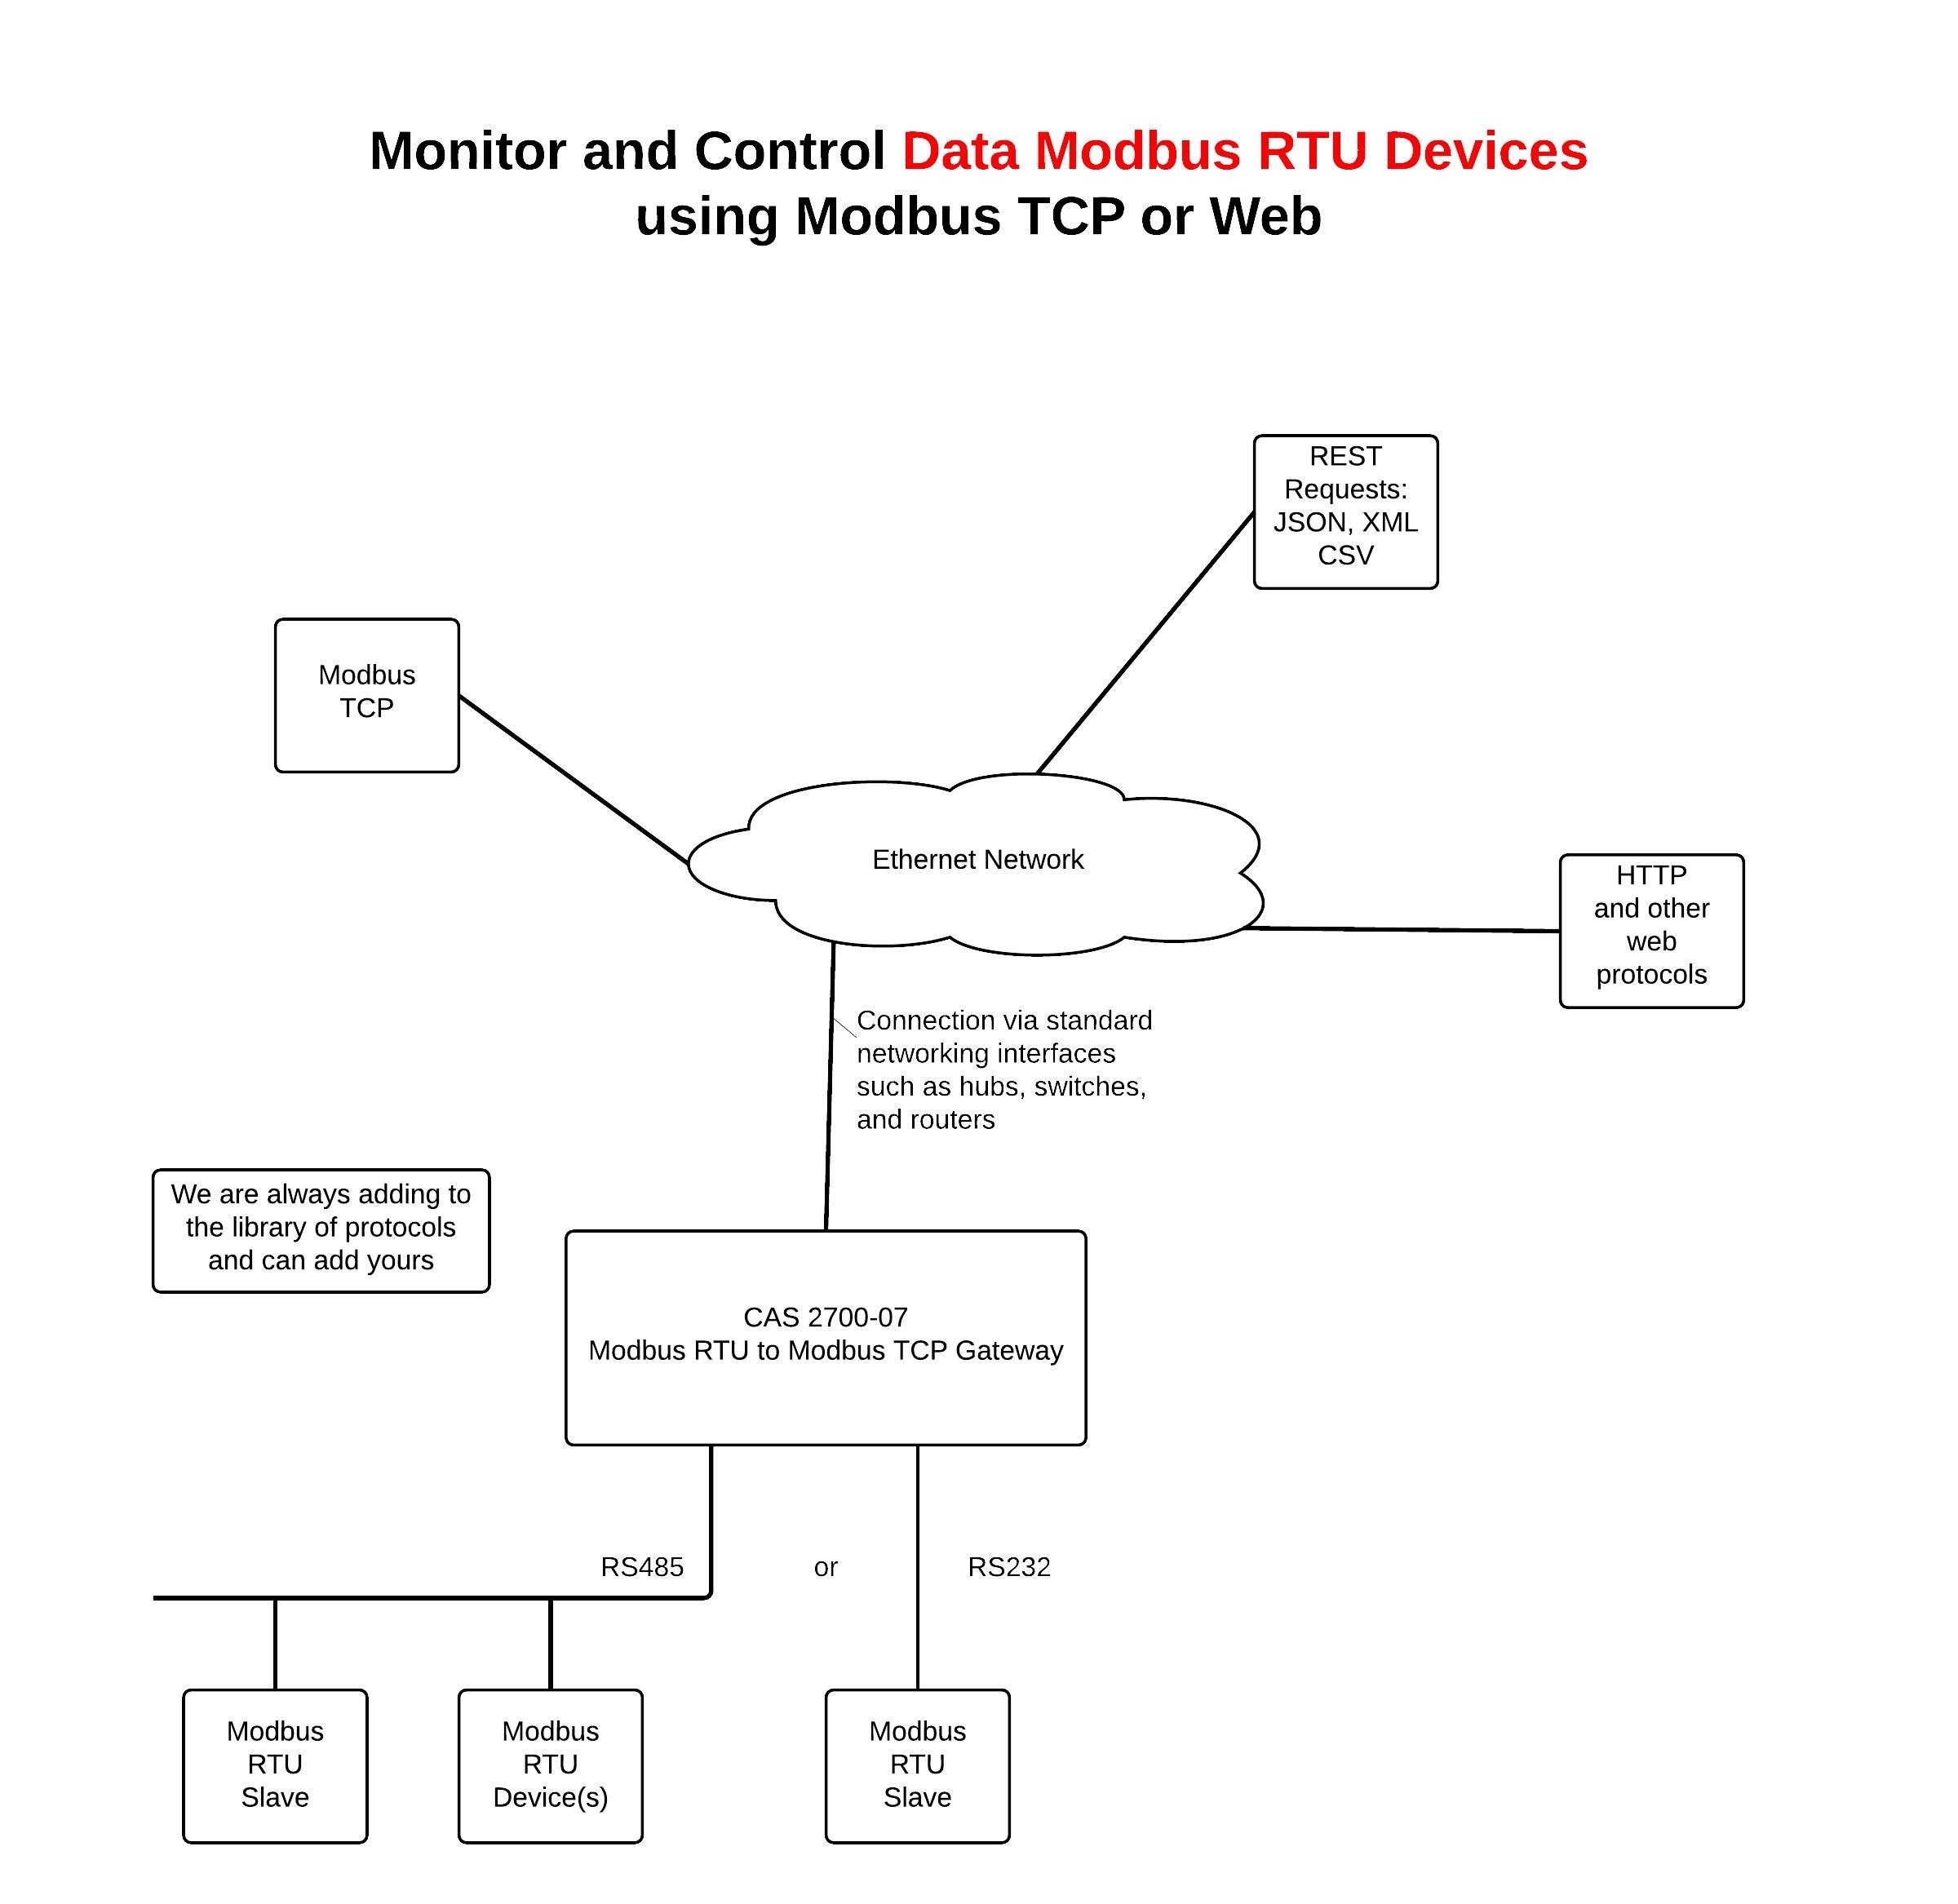 wr250rx wiring diagram 2120x1426 wire center u2022 rh theiquest co